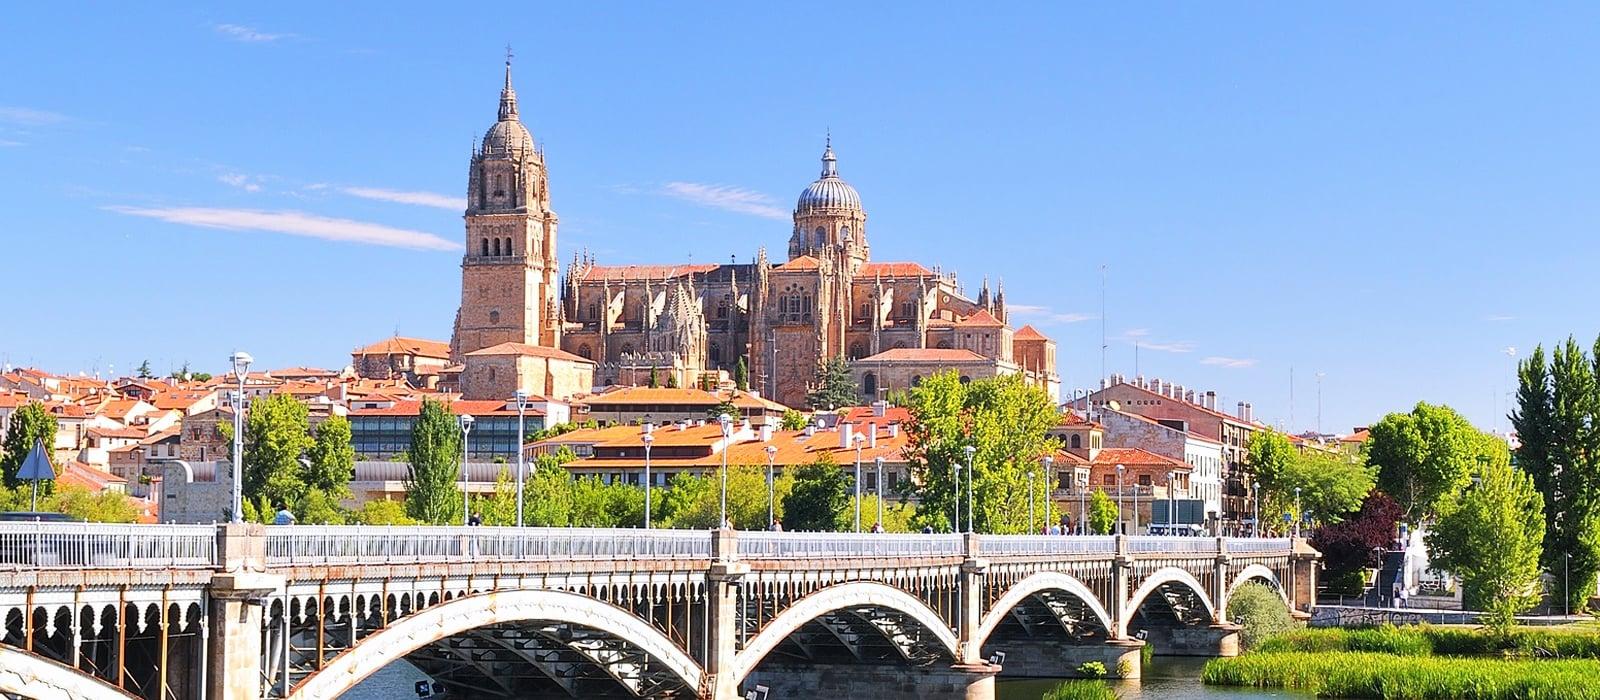 Salamanca - Vincci Hoteles